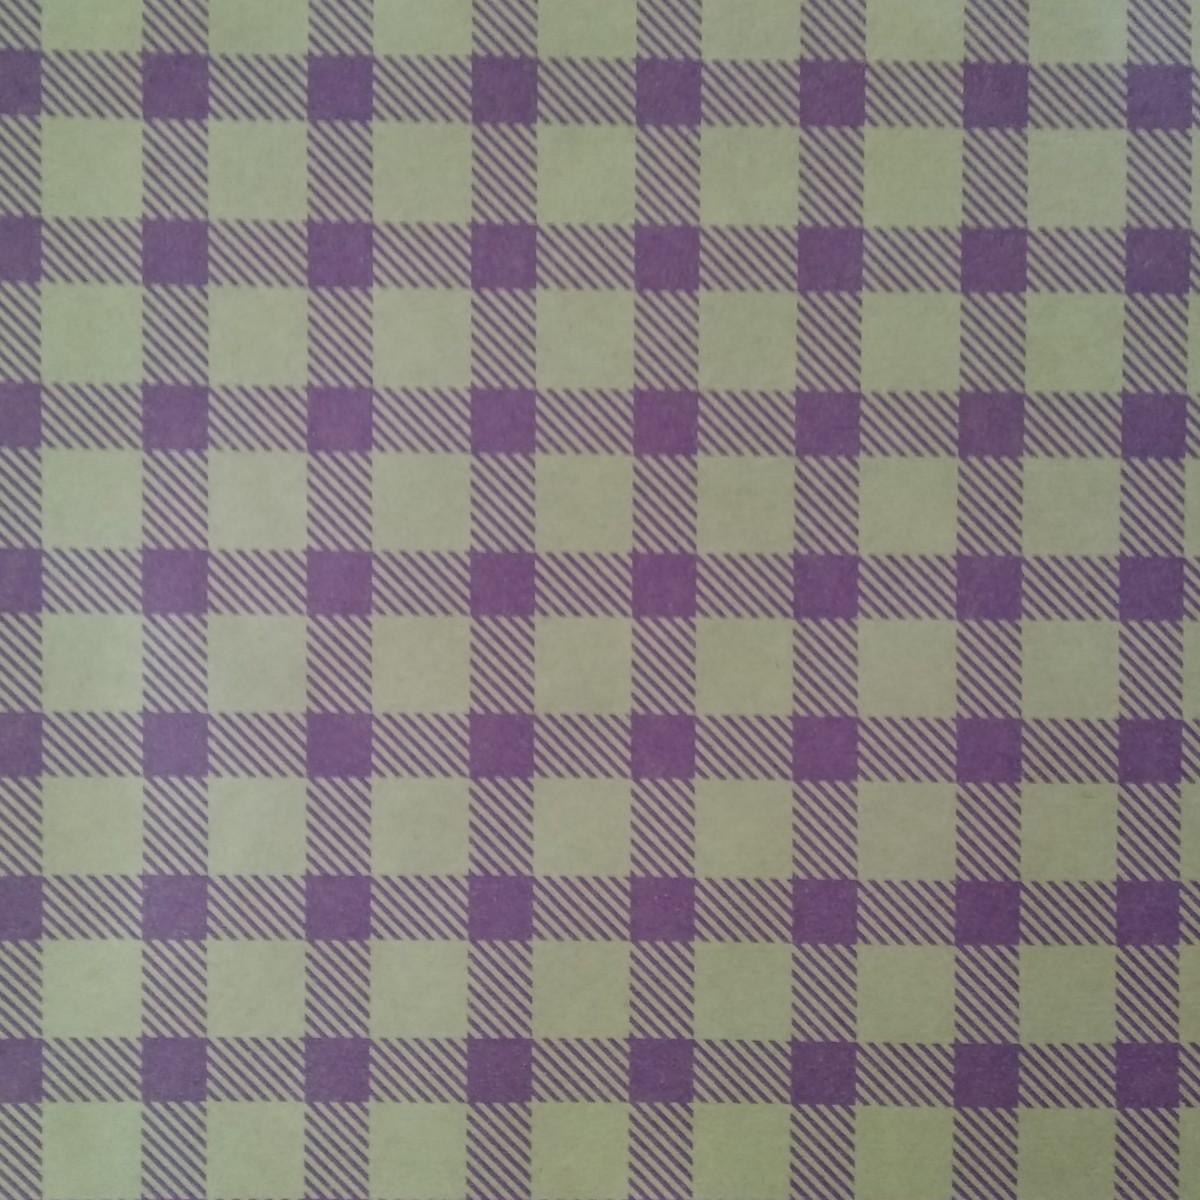 7214 Chex Print Purple 50cmx25m Kraft Paper - 1 Roll